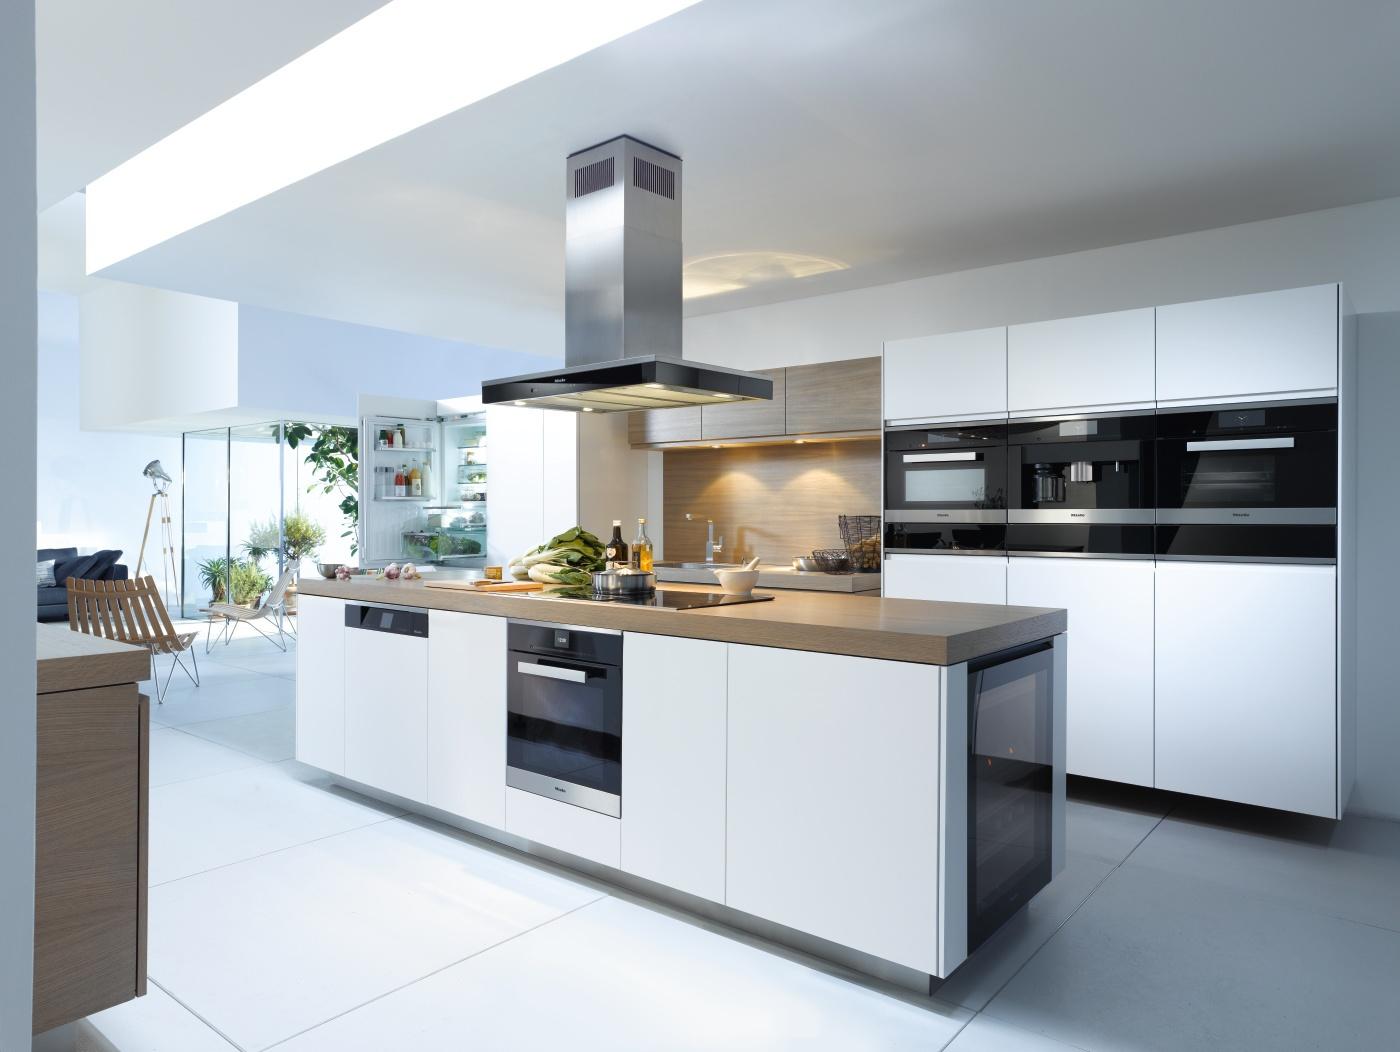 qualitativ hochwertig innovativ einfach perfekt die. Black Bedroom Furniture Sets. Home Design Ideas